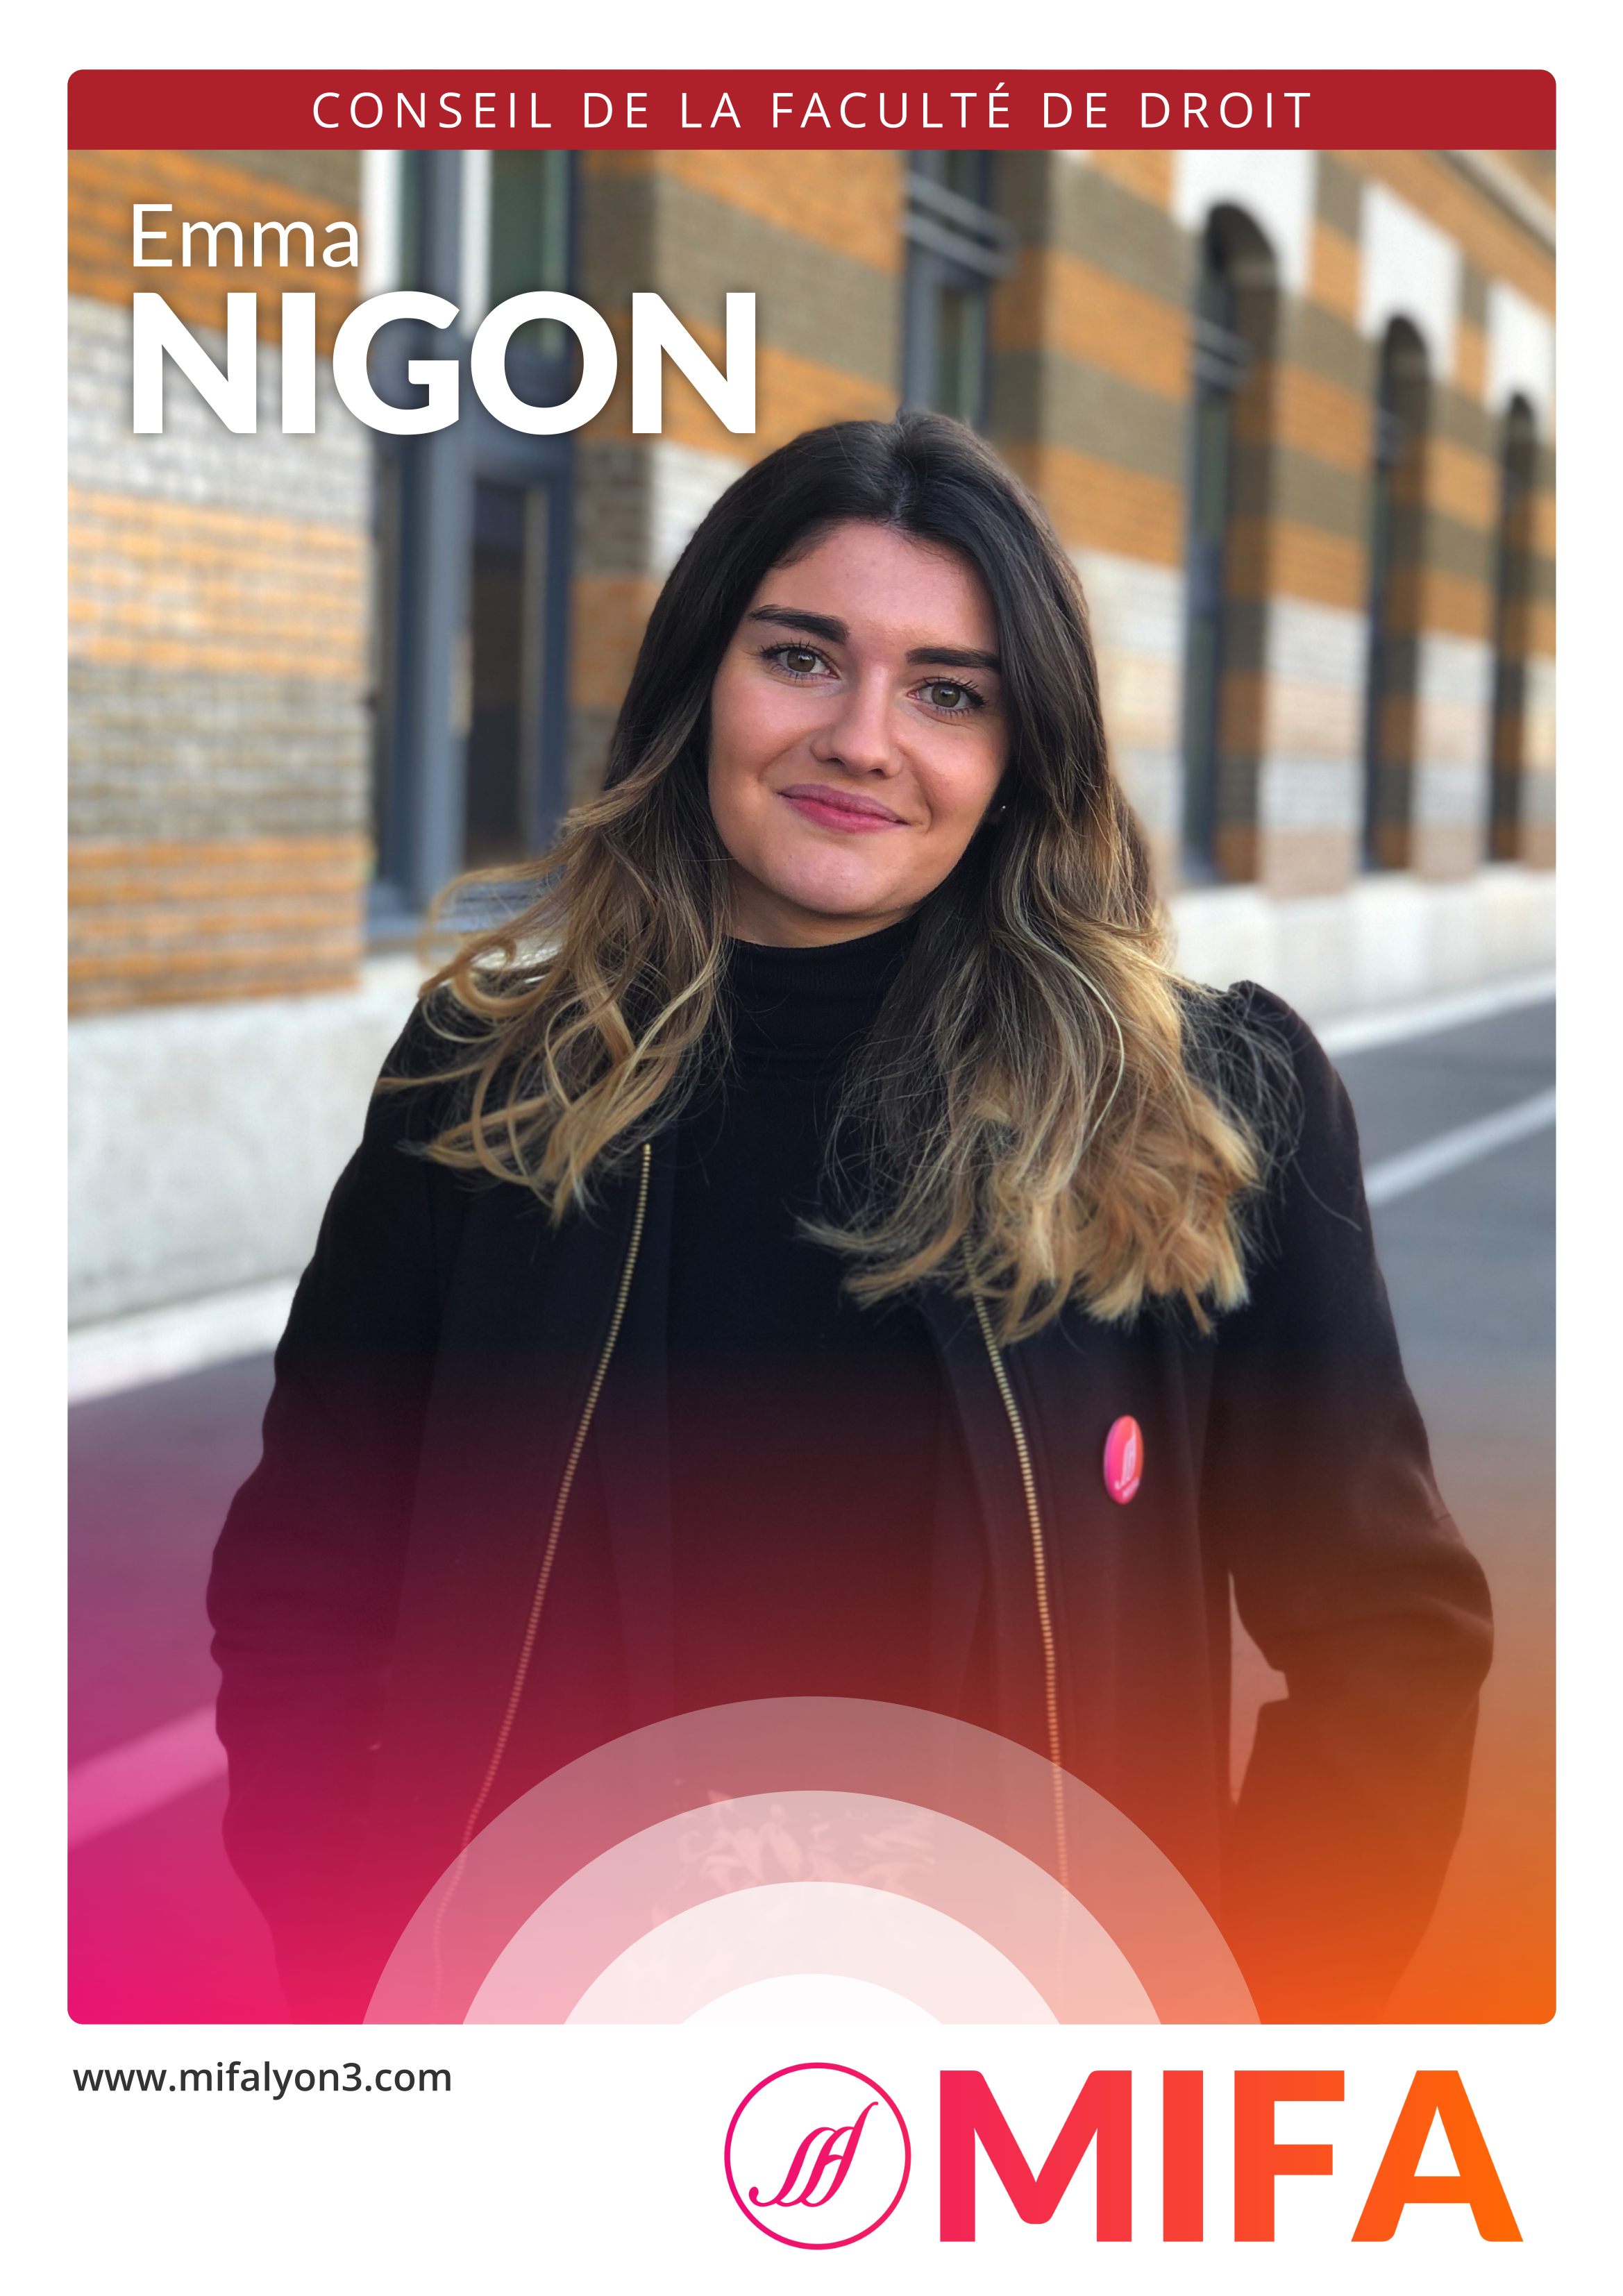 Emma NIGON